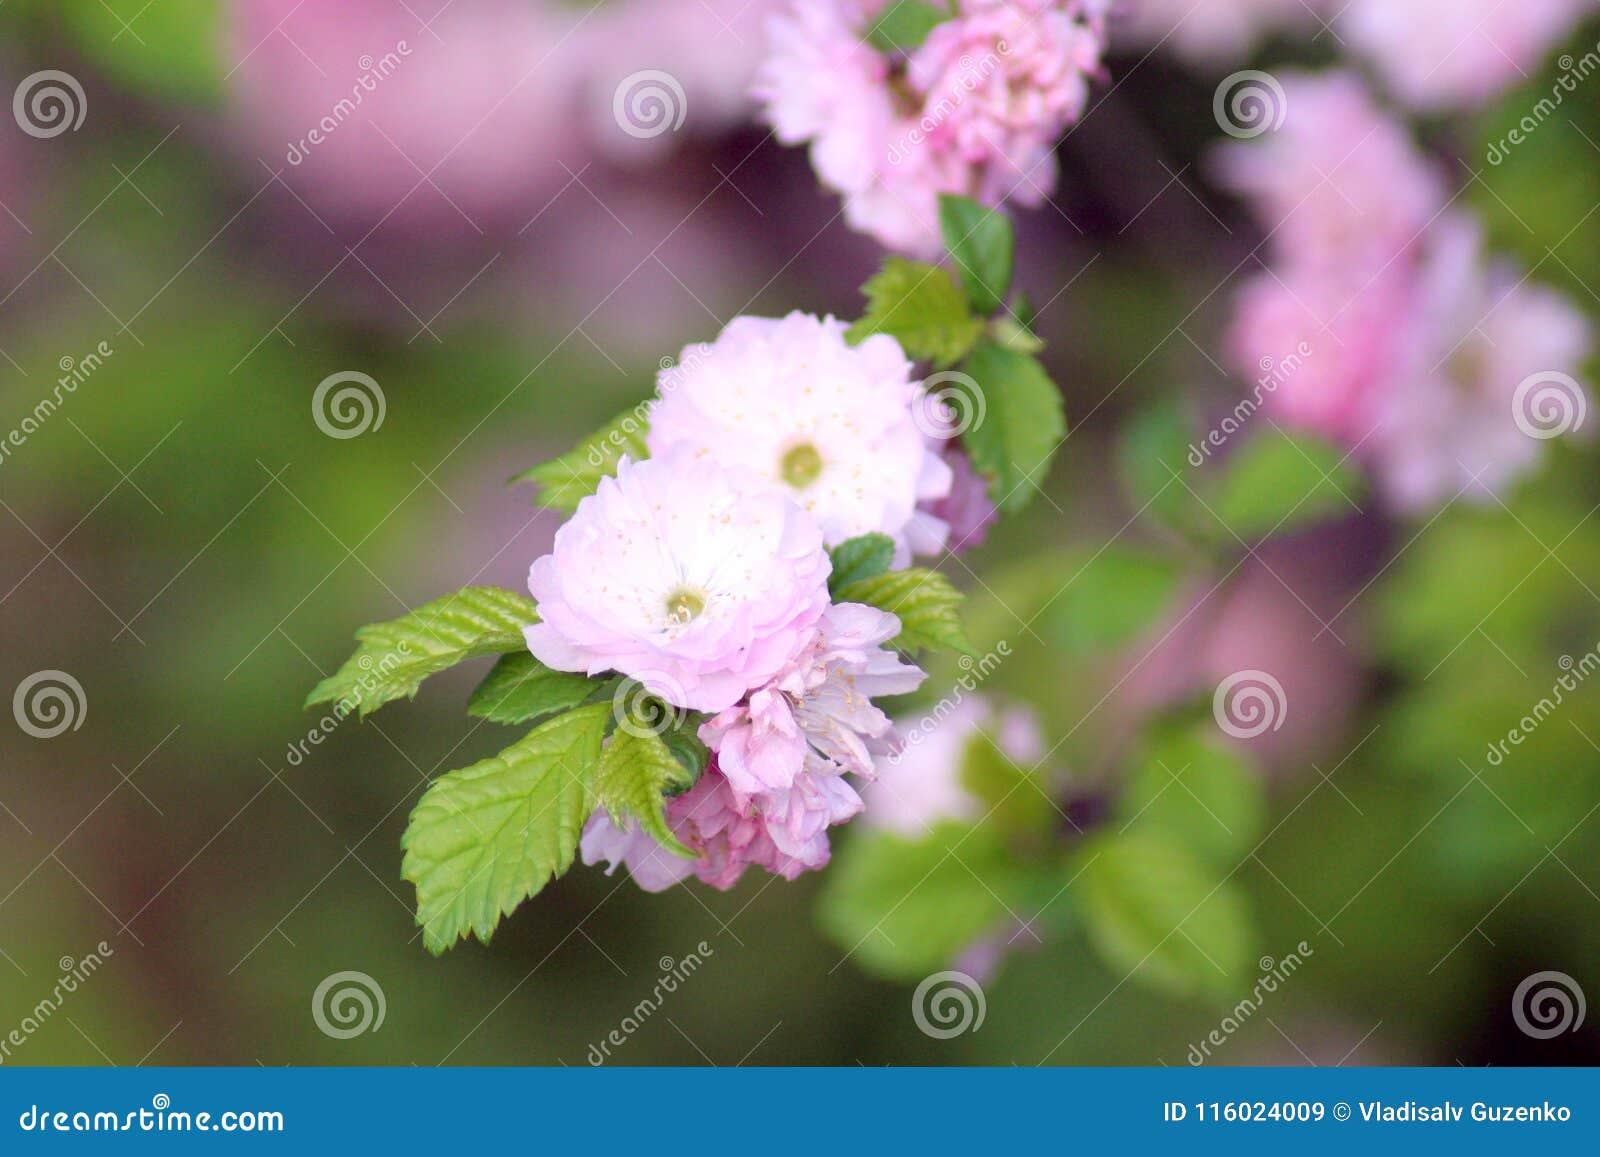 Flowering Almond Bush Stock Image Image Of Blue Leaf 116024009